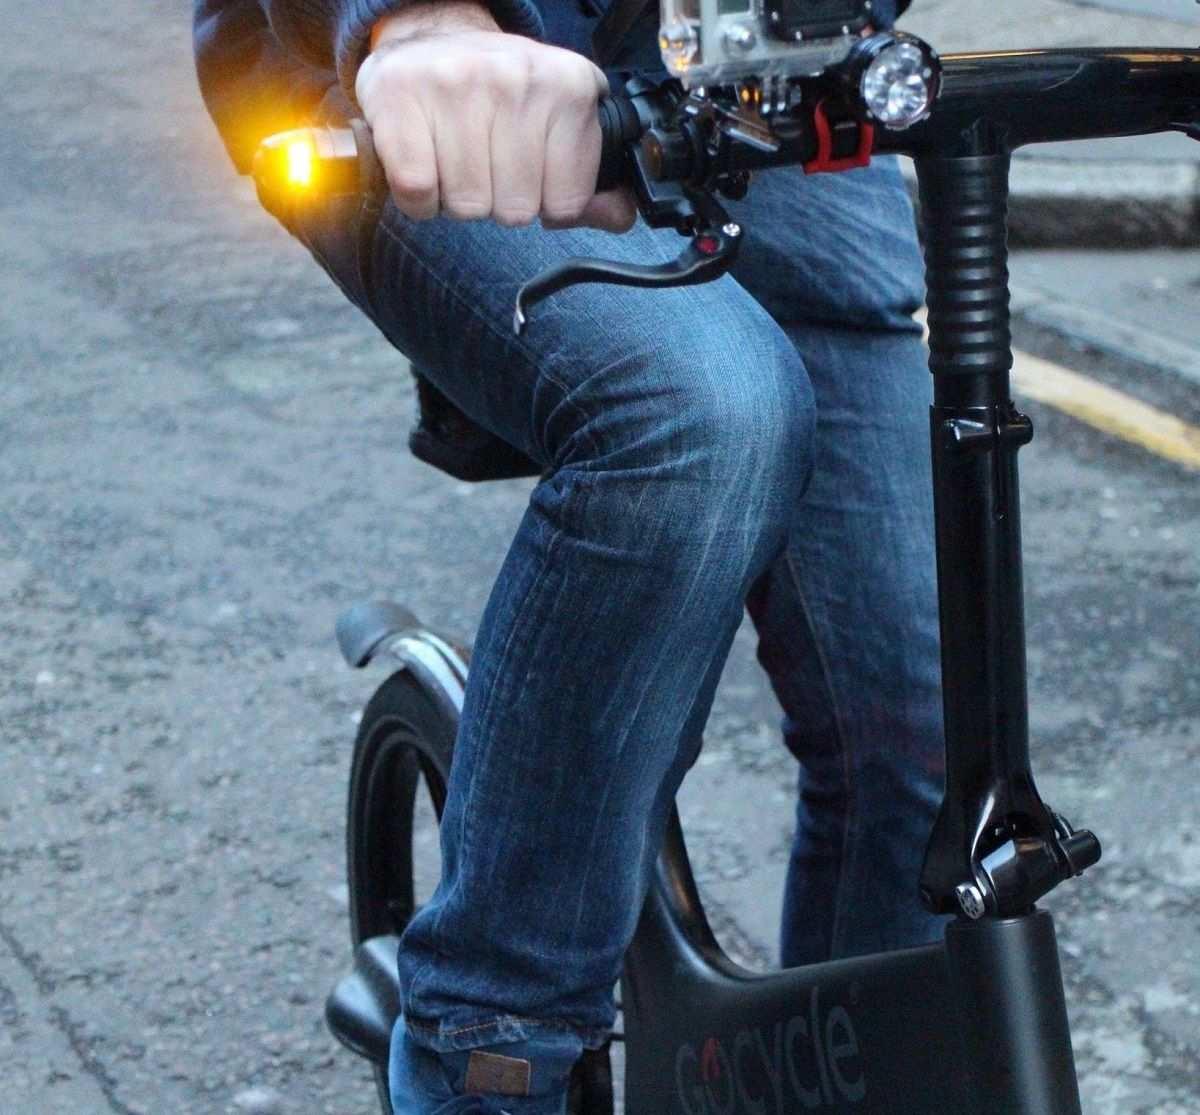 intermitentes para bici